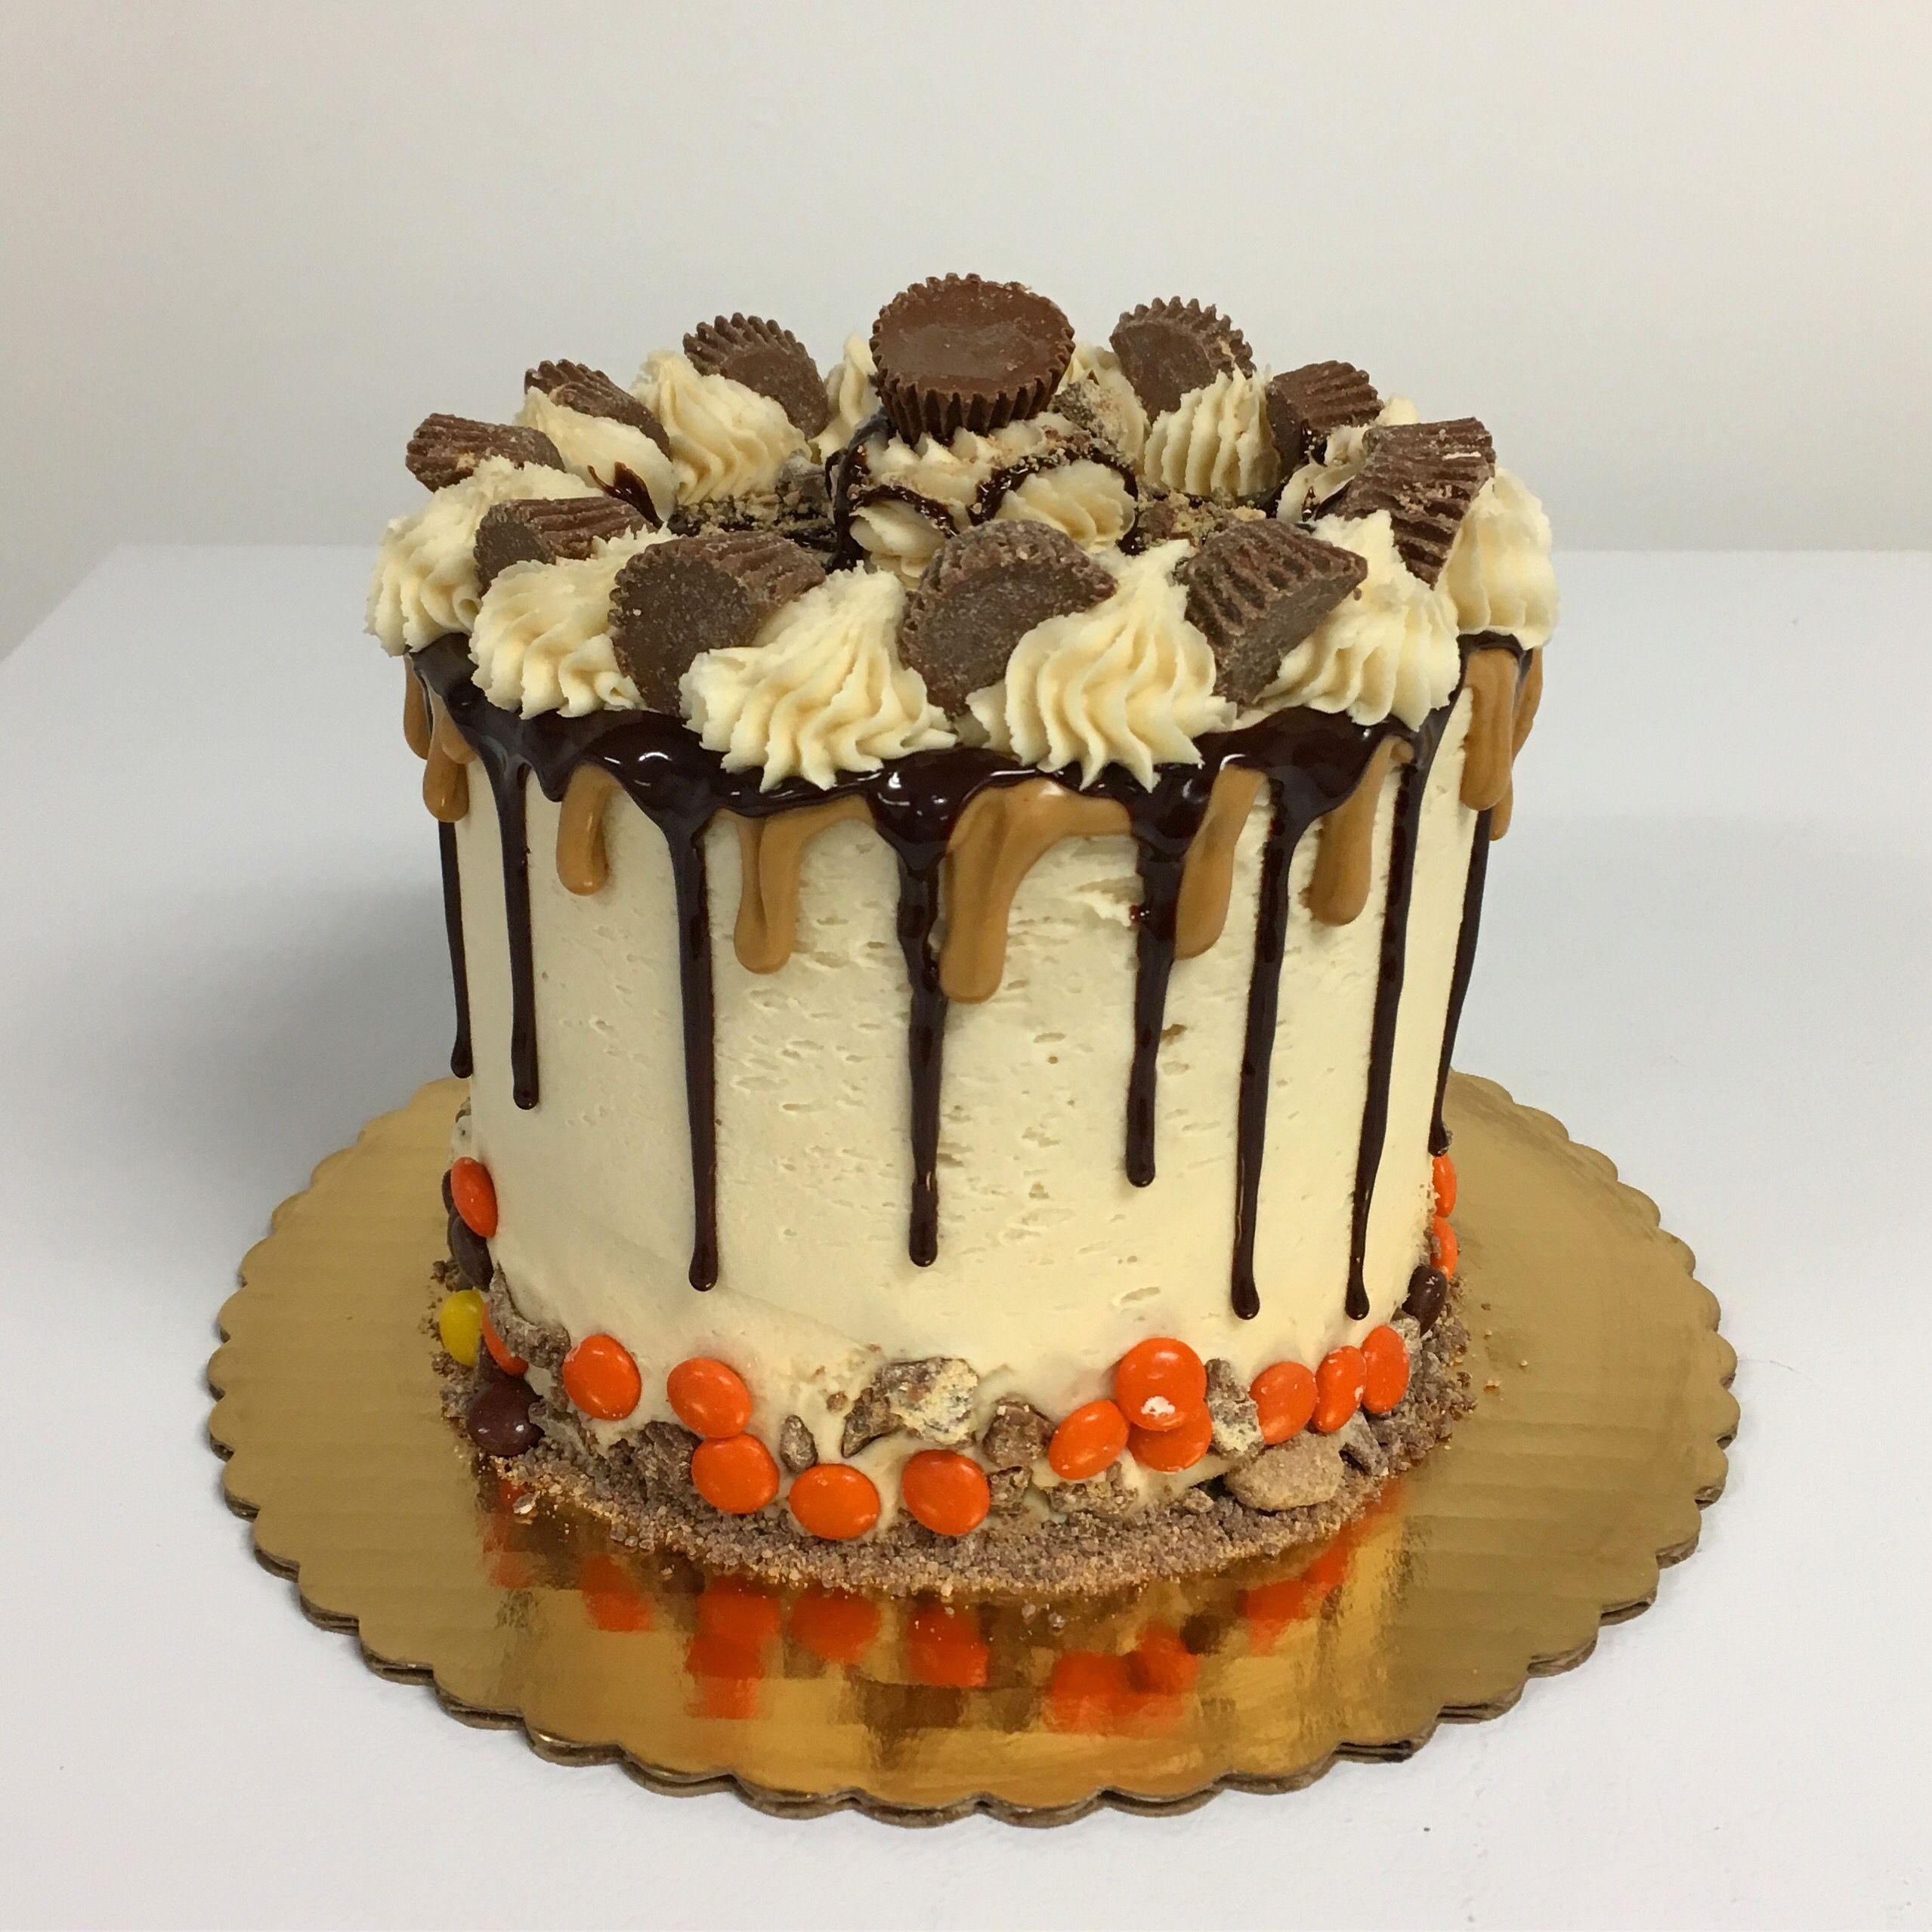 Reesie Peanut Butter Cup Drip Cake